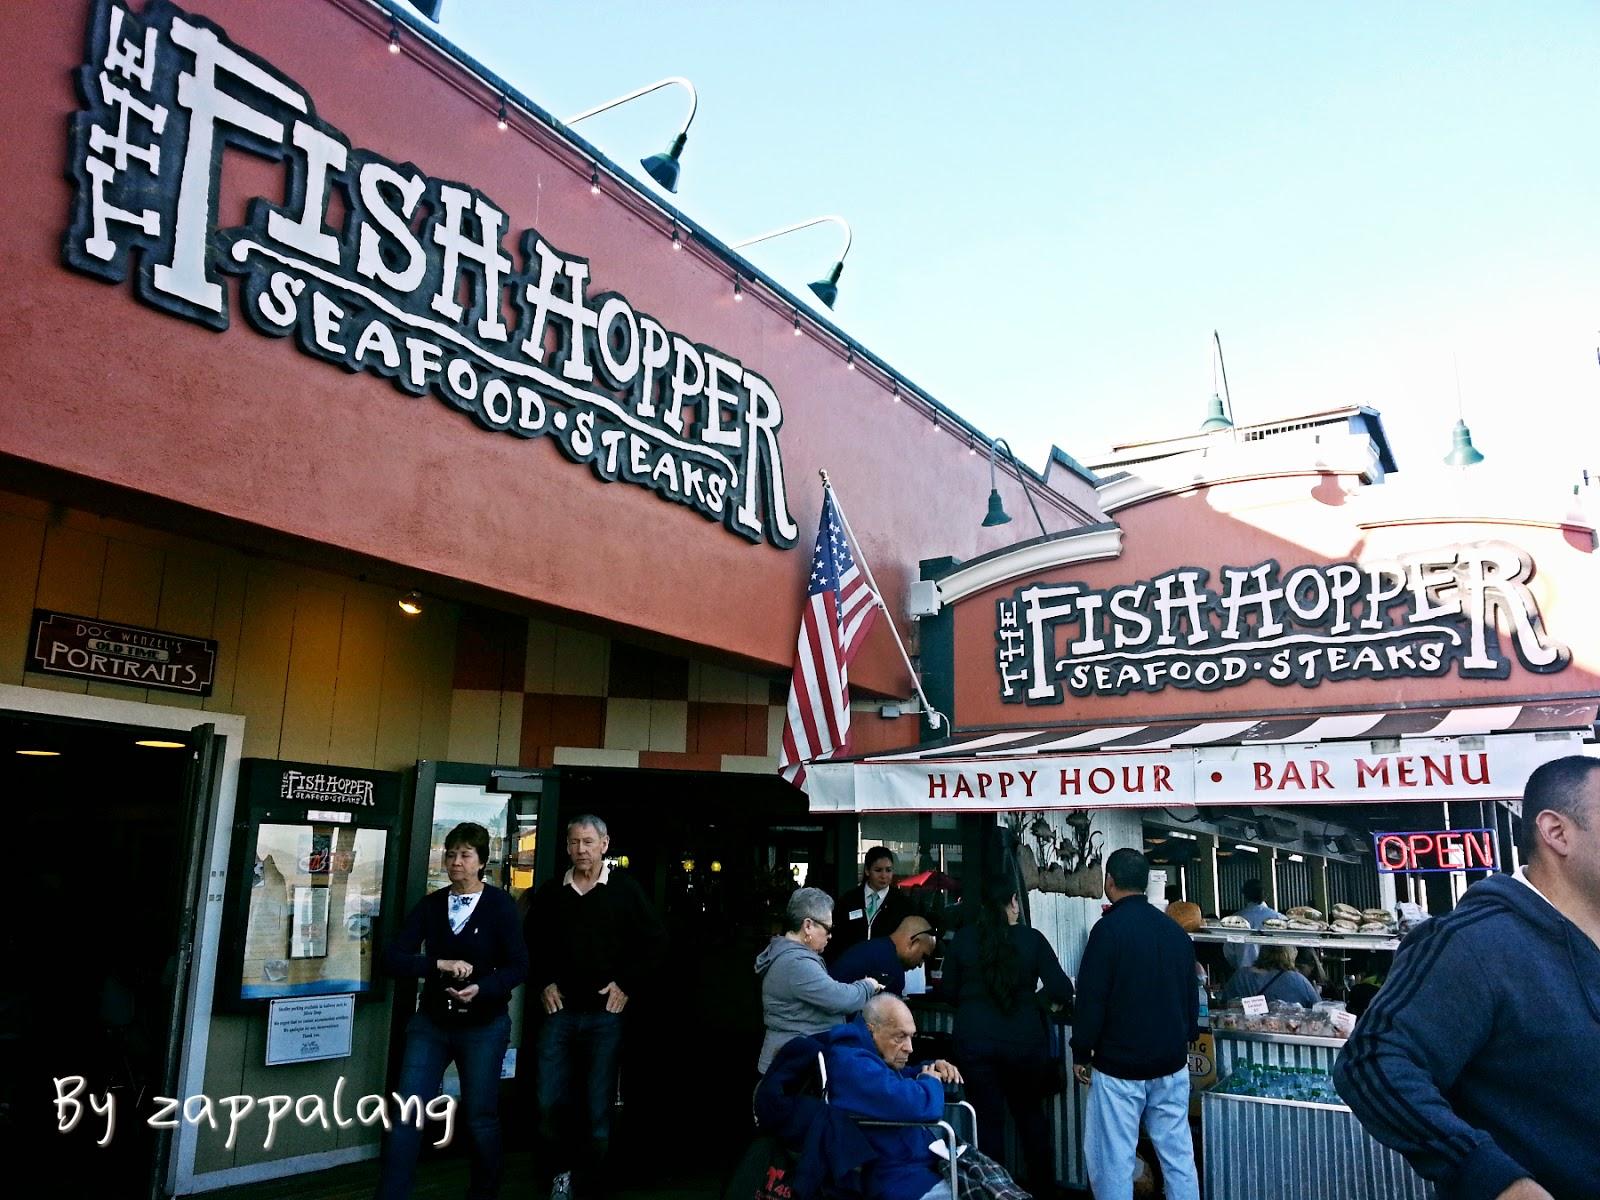 Zappalang 04 my california dream the fish for The fish hopper